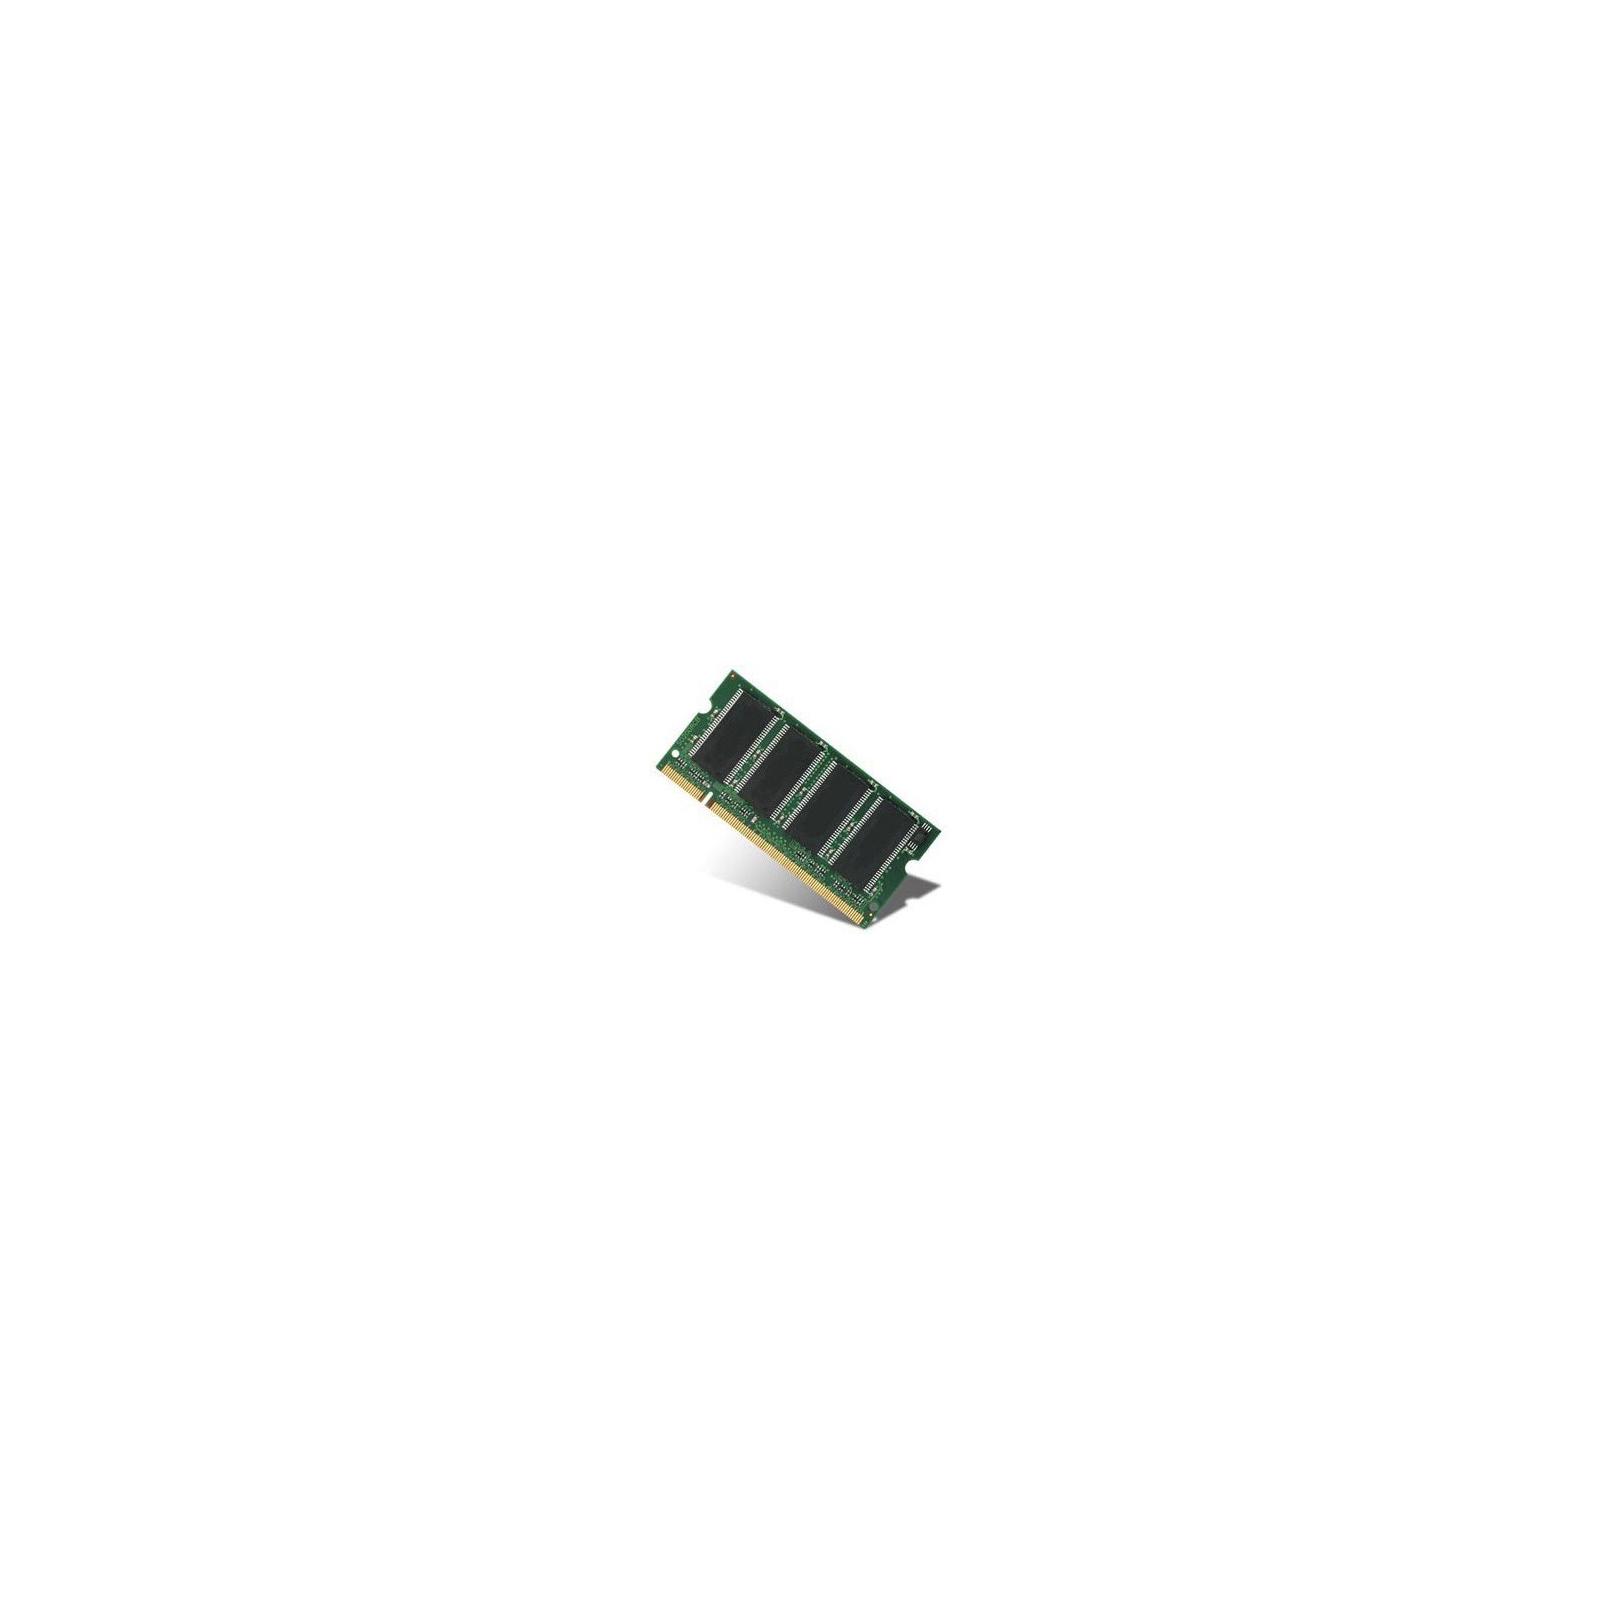 Модуль памяти для ноутбука SoDIMM DDR2 2GB 800 MHz G.Skill (F2-6400CL5S-2GBSQ)